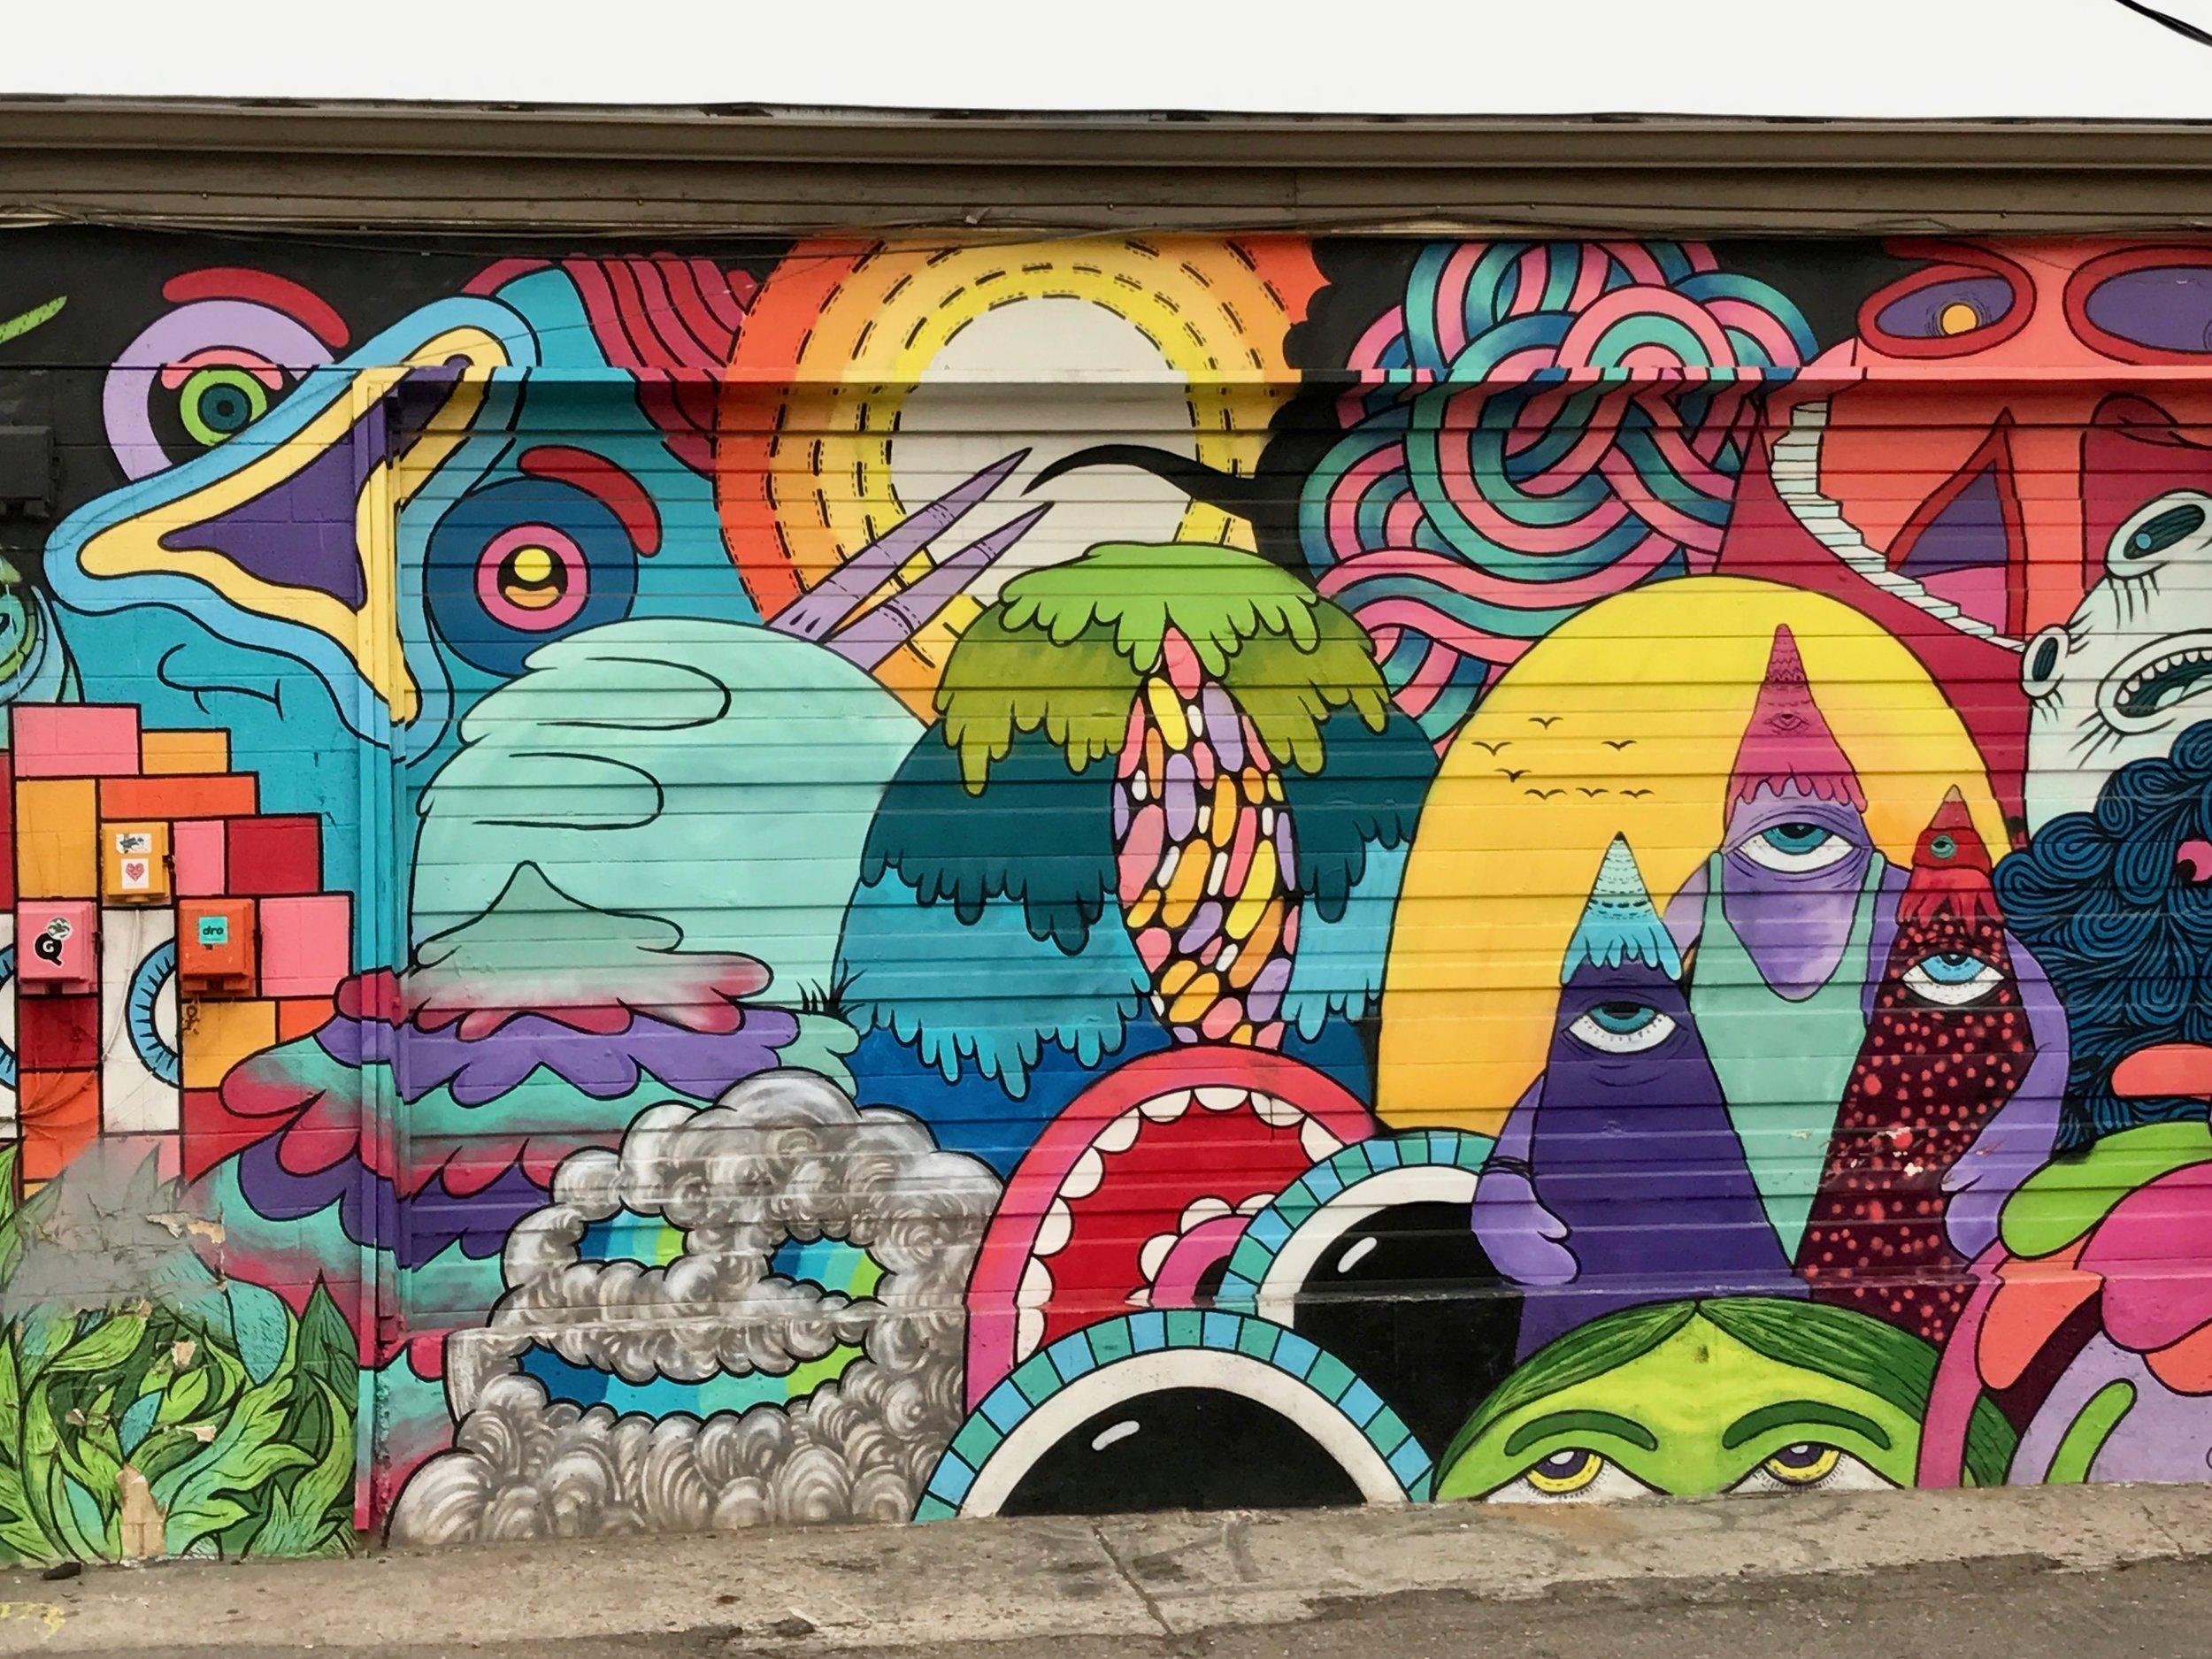 A mural by  RUMTUM  in Denver's RiNo neighborhood.